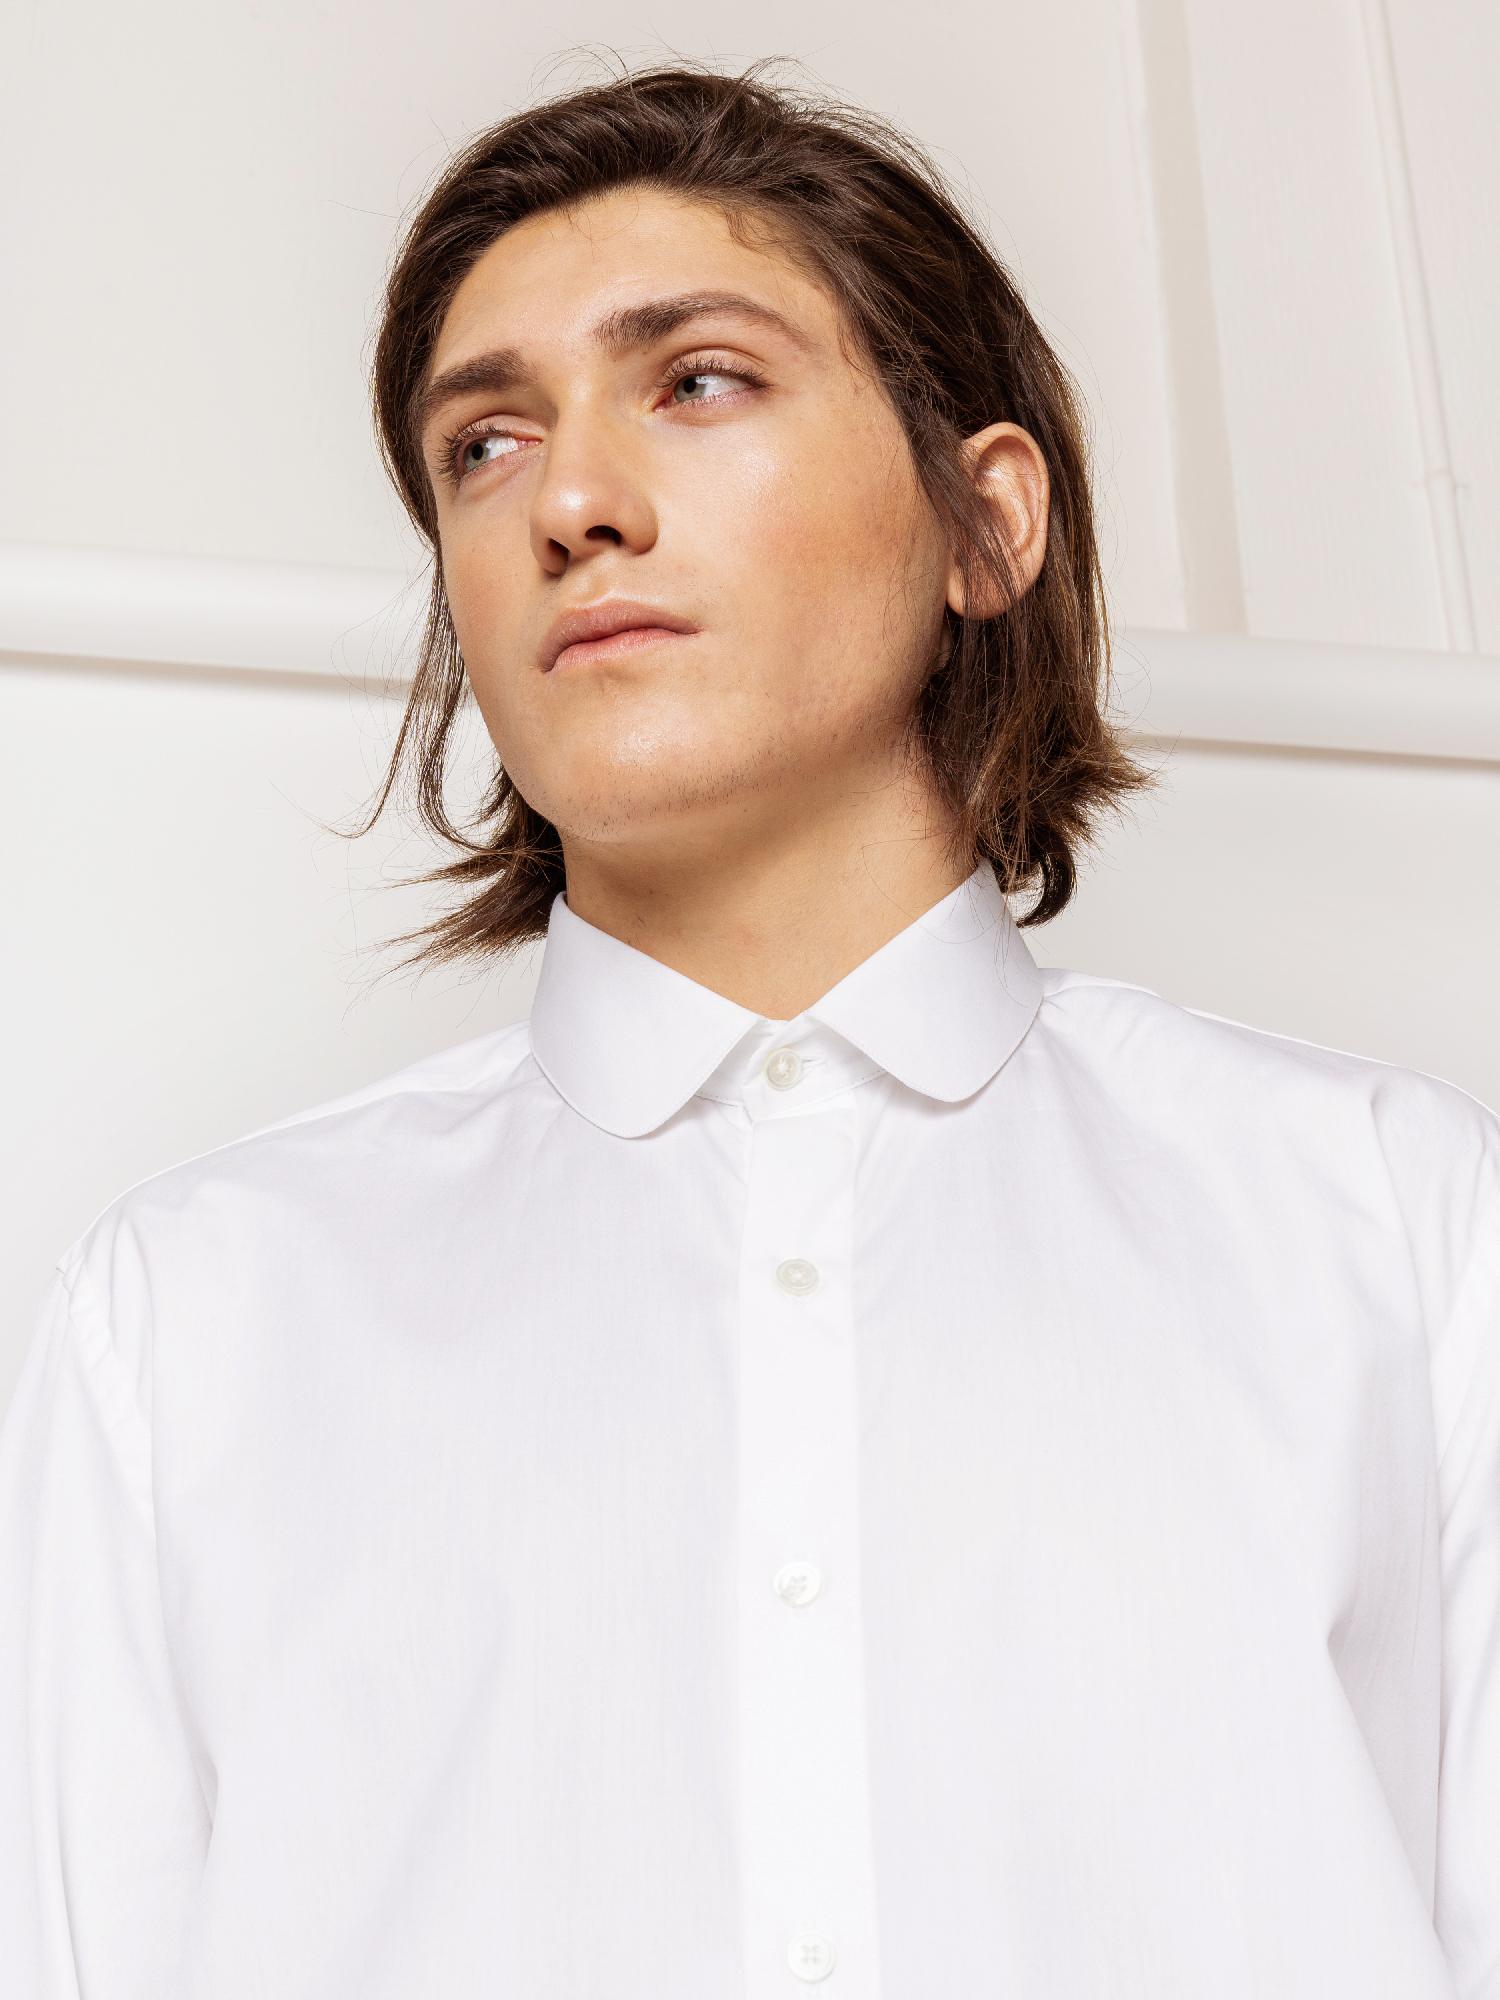 GarciaMadrid-camisa-blanca-13-g-Editar.jpg